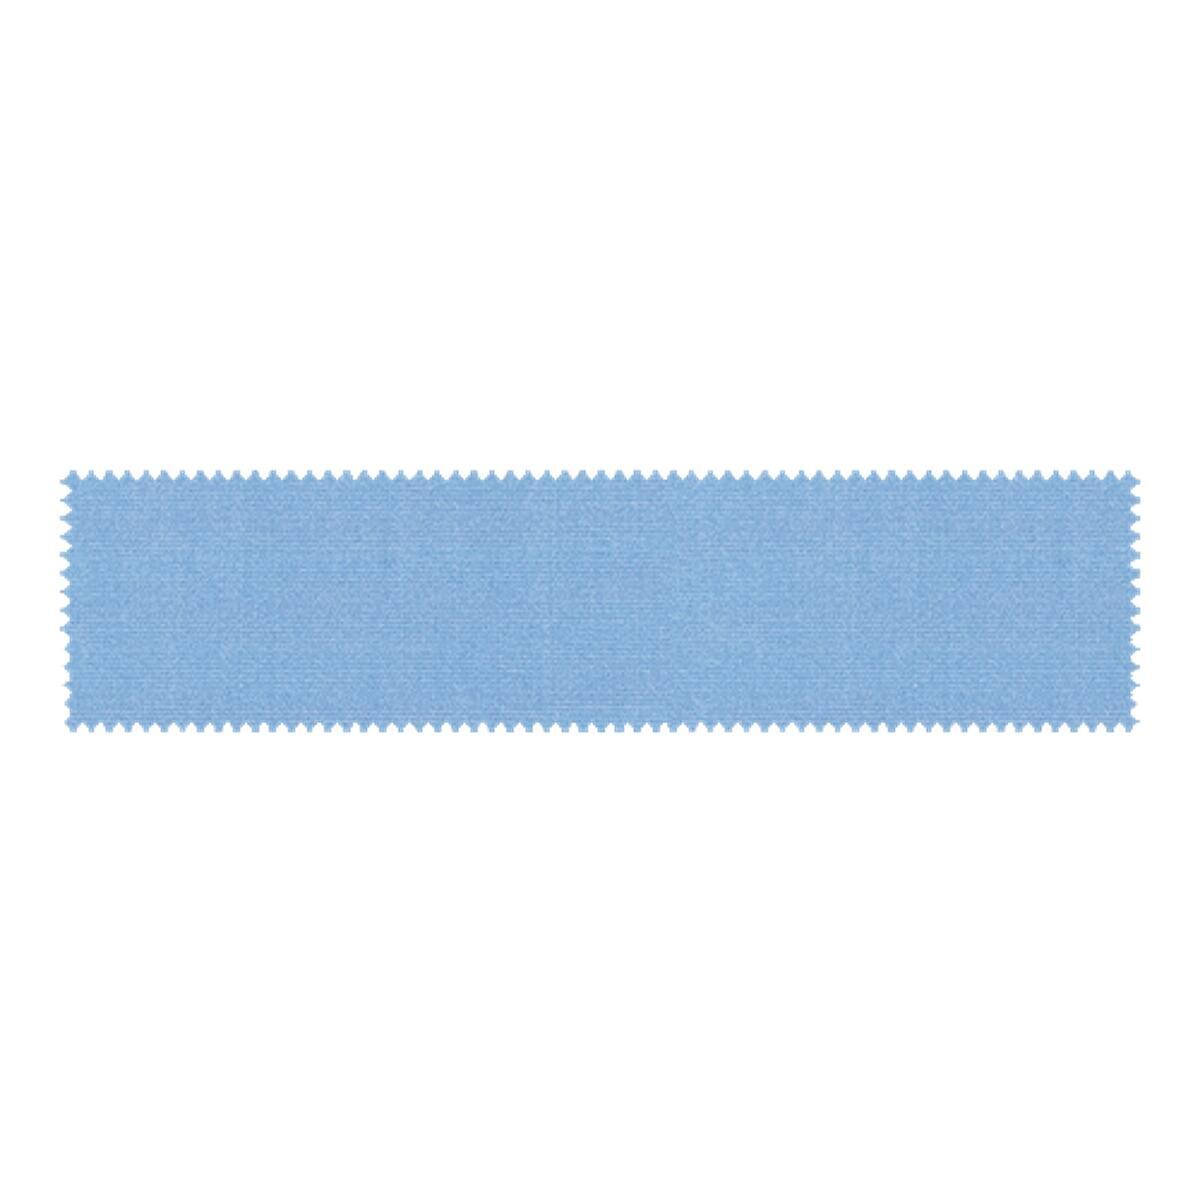 Tenda da sole a bracci estensibili TEMPOTEST PARA' L 3.5 x H 2 m Cod. 17/15 azzurro - 3